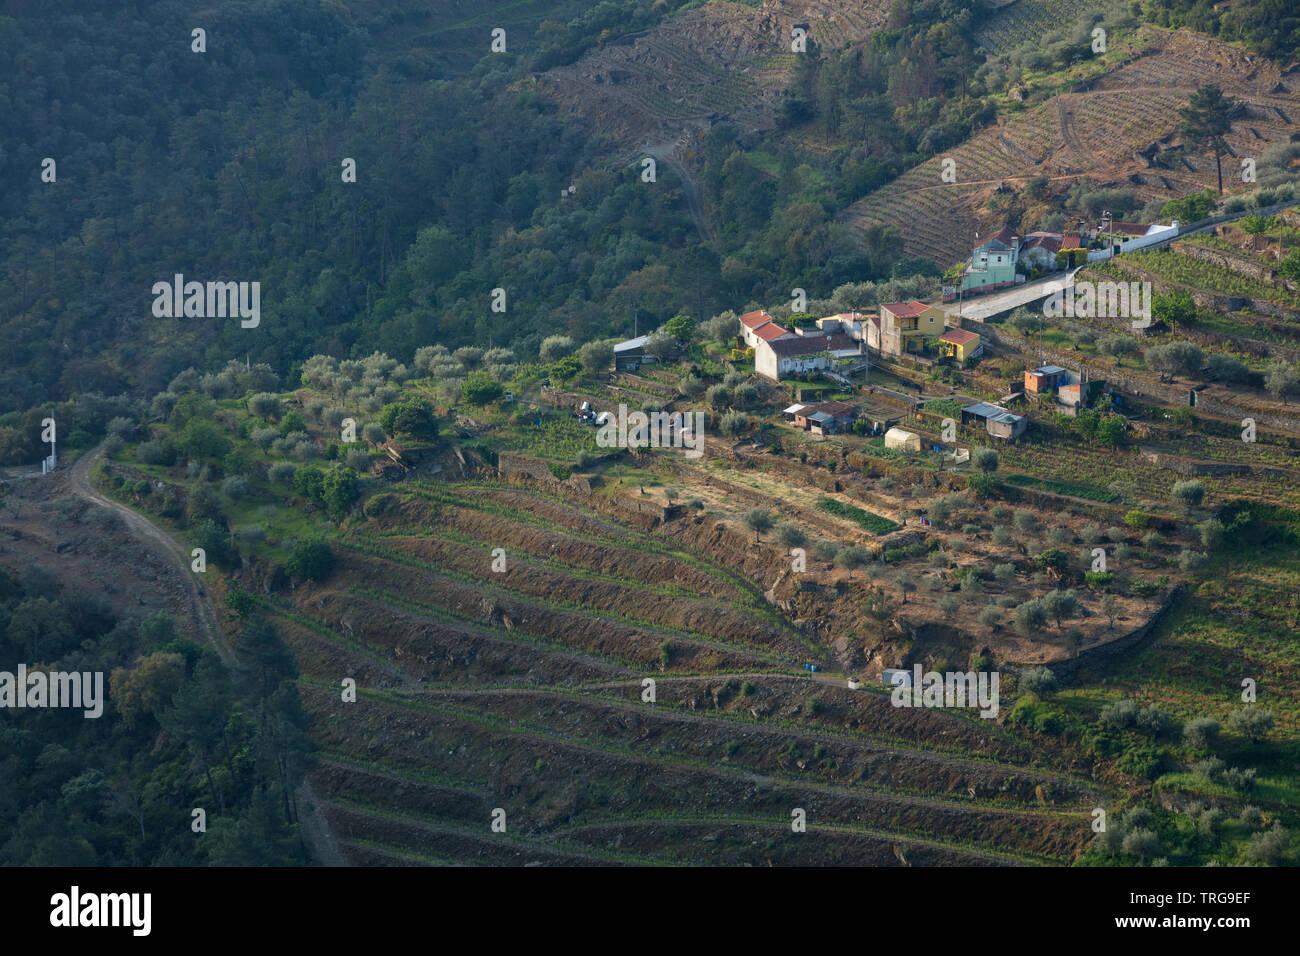 São Cristovão do Douro in the Douro Valley wine region, Vila Real, Portugal - Stock Image